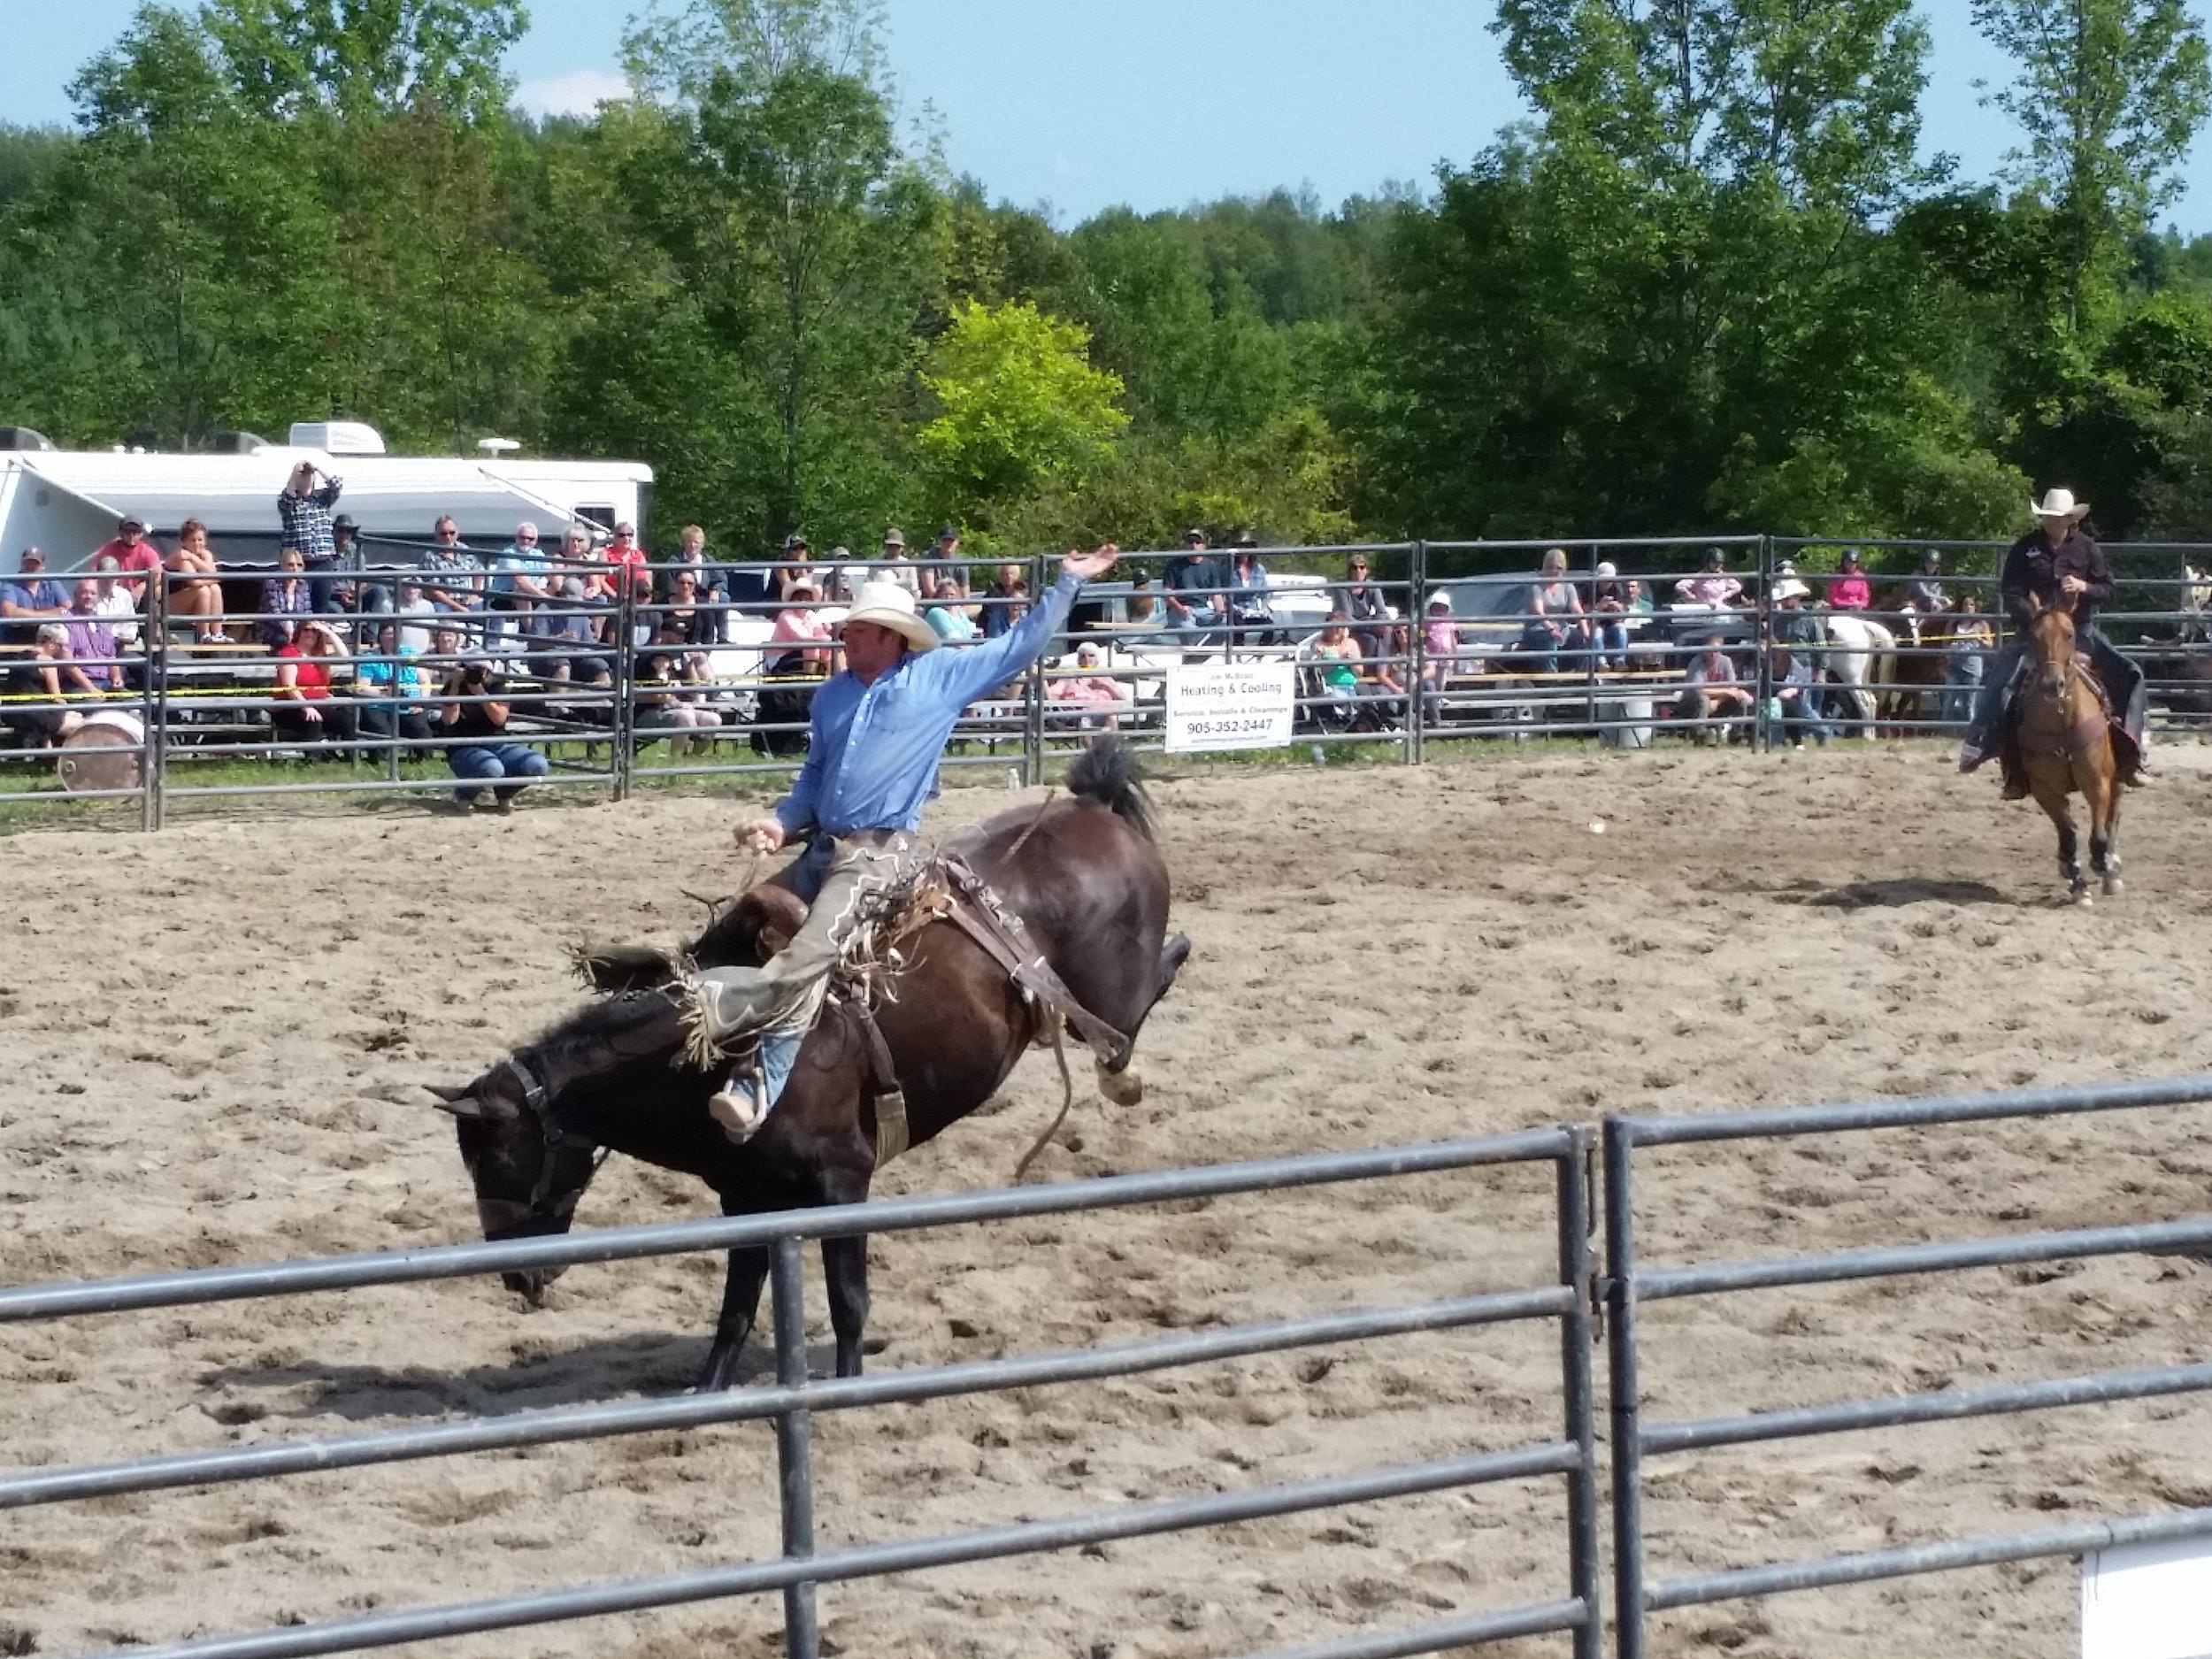 Bucking horses.